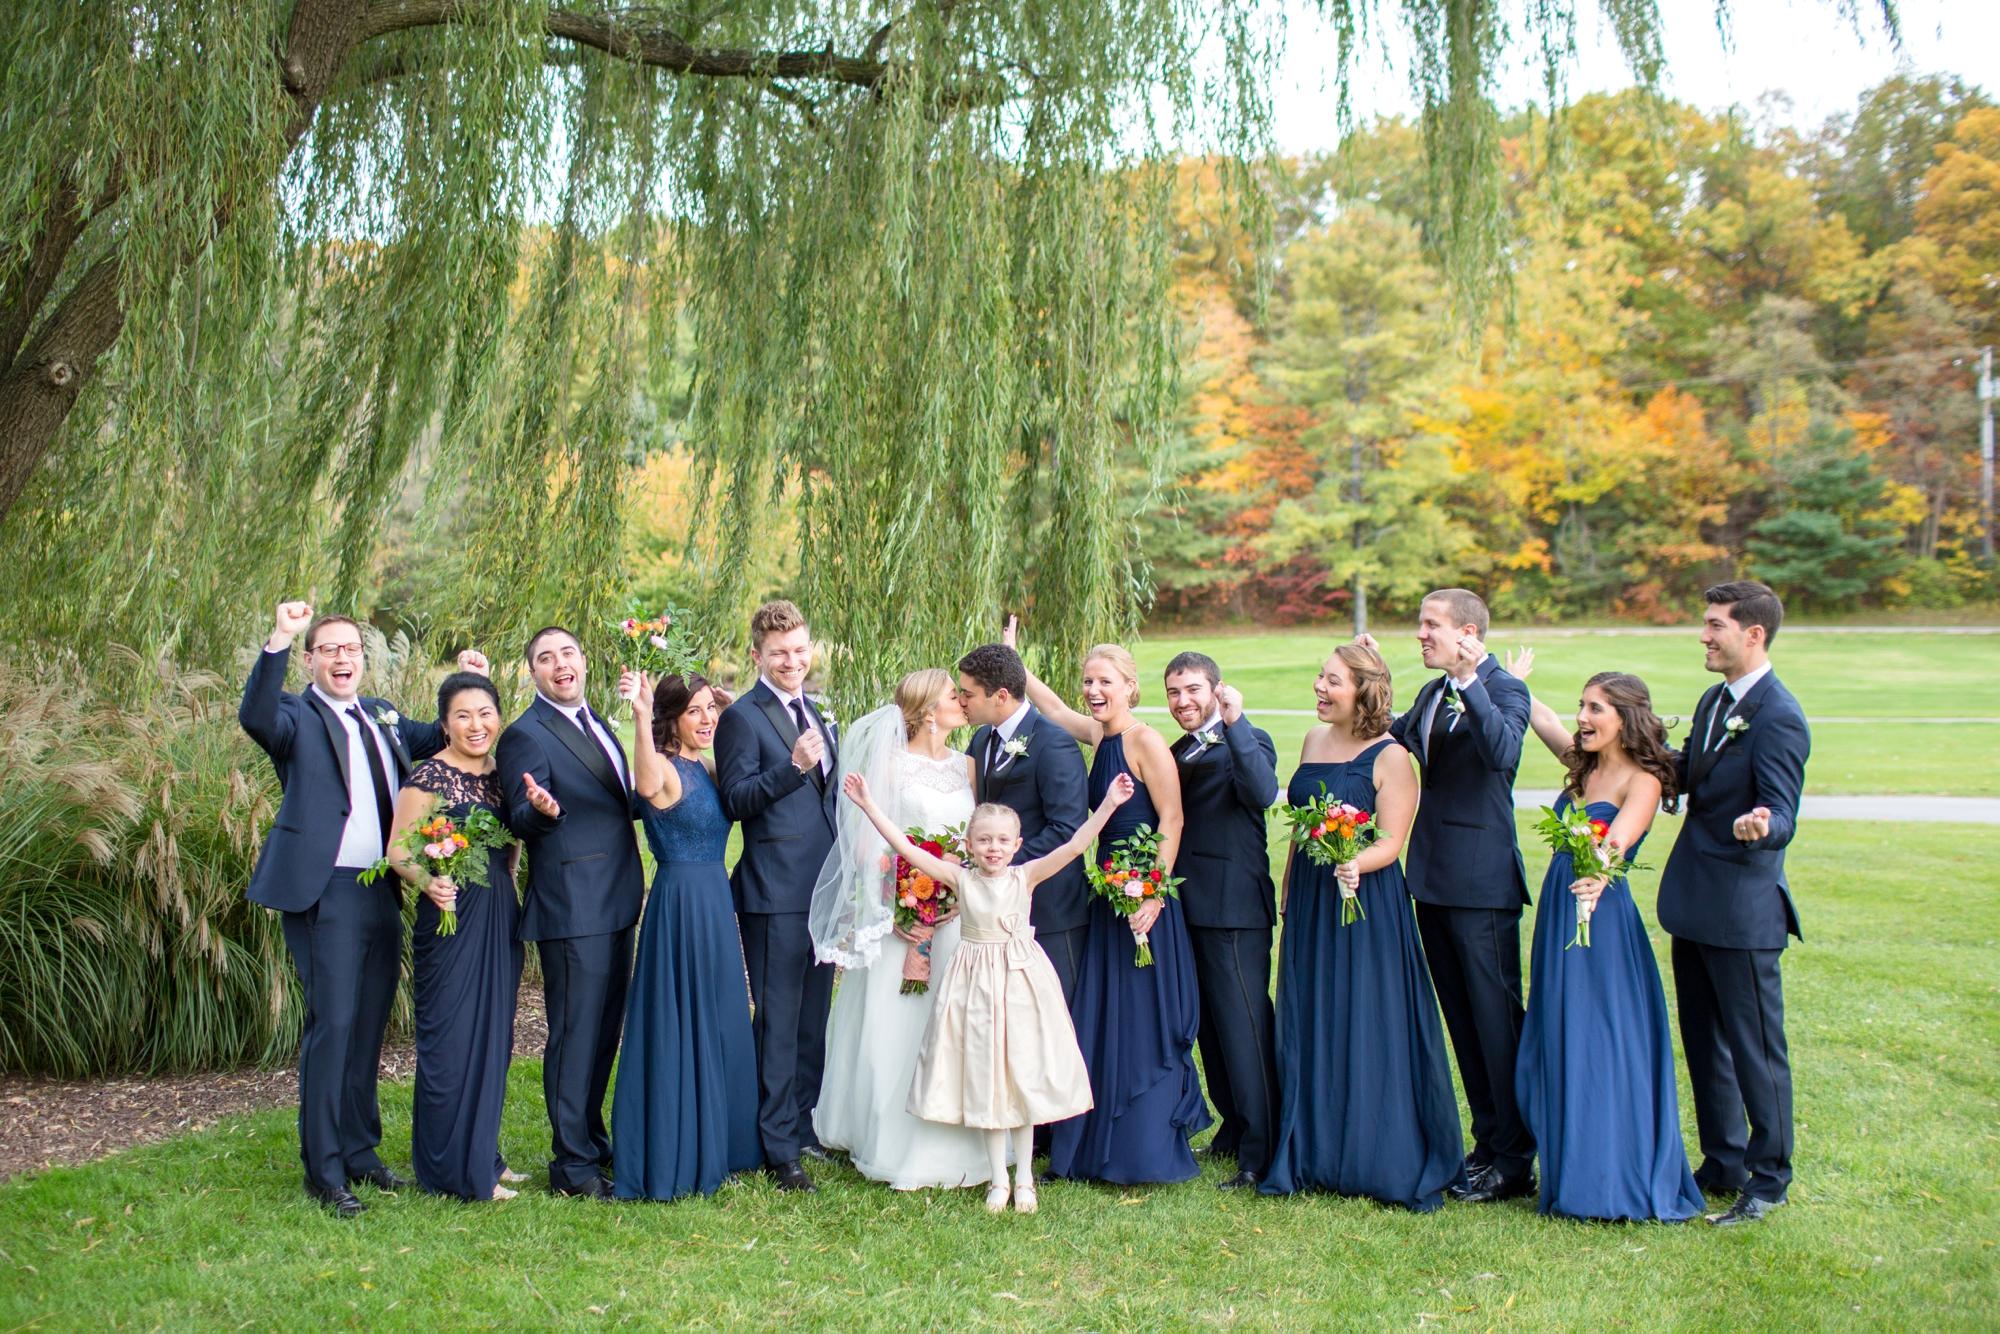 3-Finkel Wedding Bridal Party-478_anna grace photography maryland wedding photographer turf valley.jpg